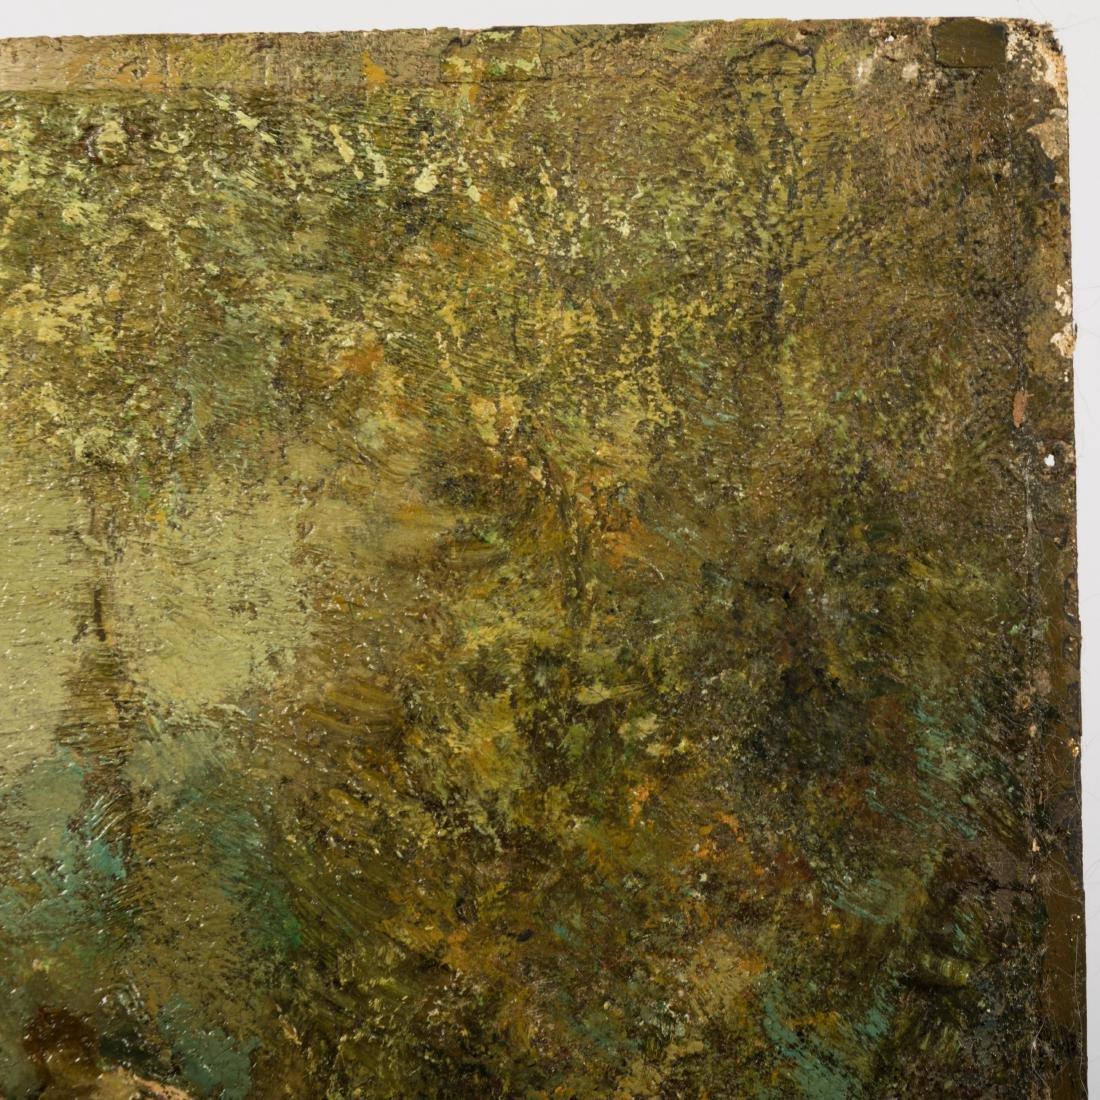 Frederick Ballard Williams - Oil on Board - 6